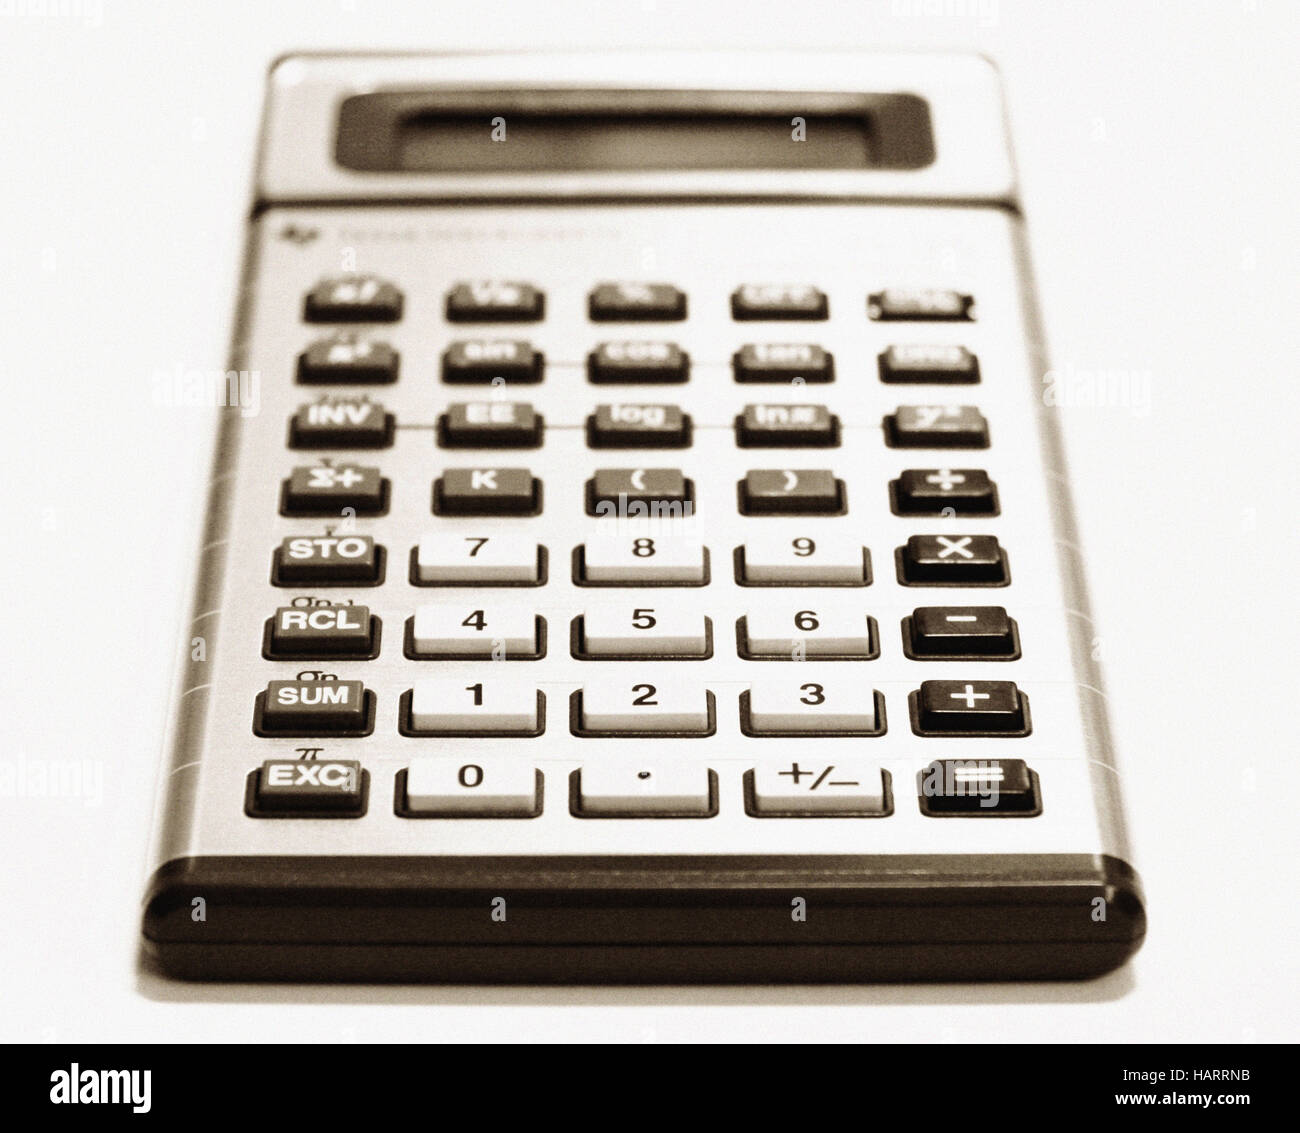 Texas Instruments Stock Photo